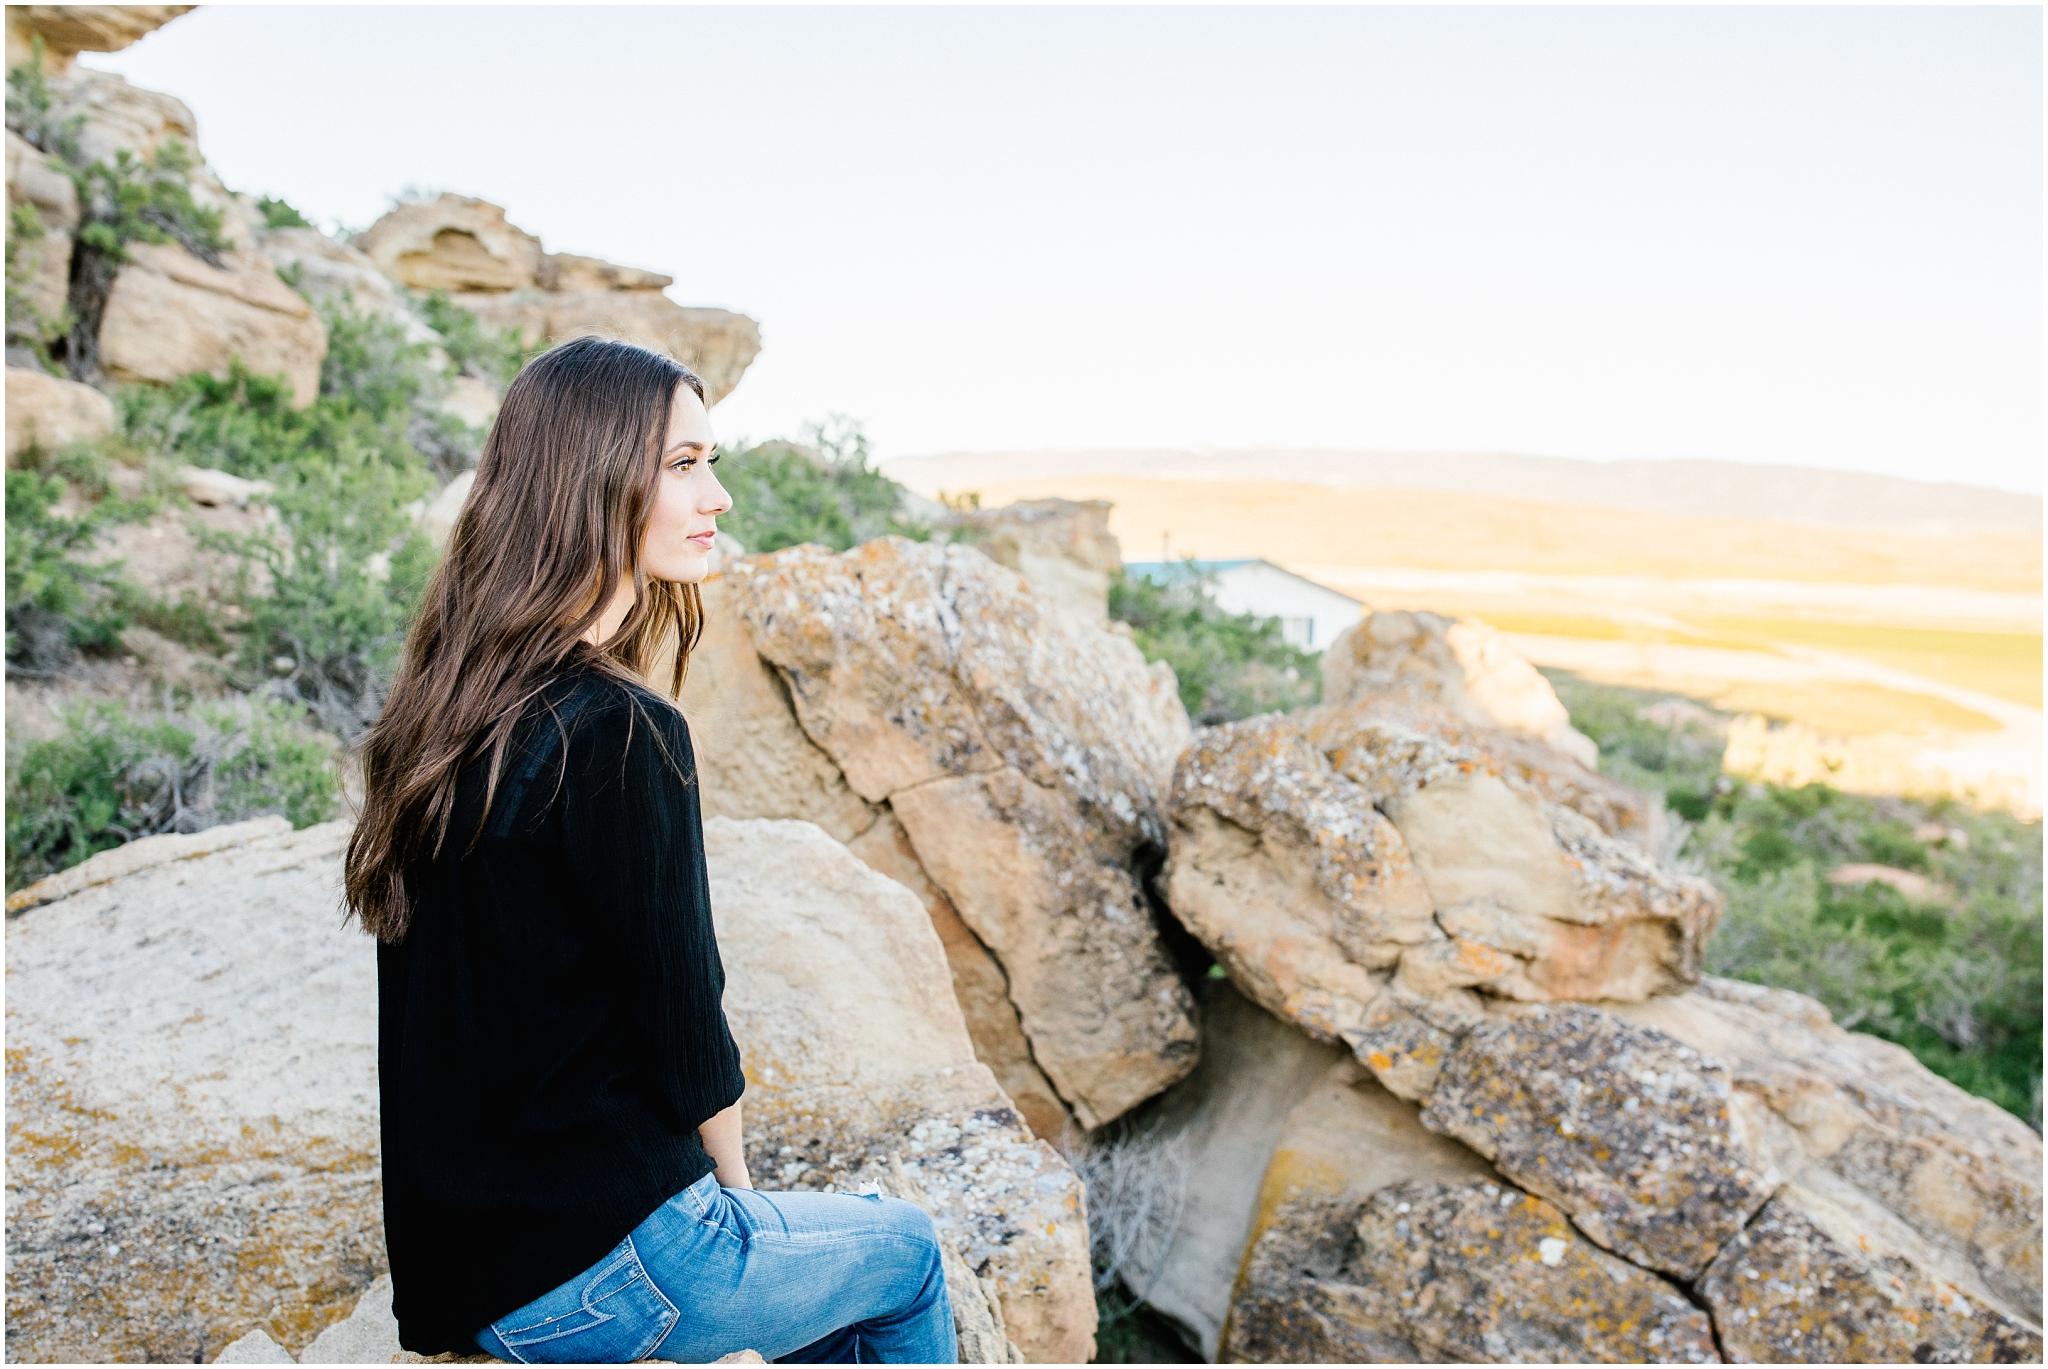 Lizzie-B-Imagery-Utah-Senior-Photographer-Central- Utah-Photographer-Utah-County_0016.jpg